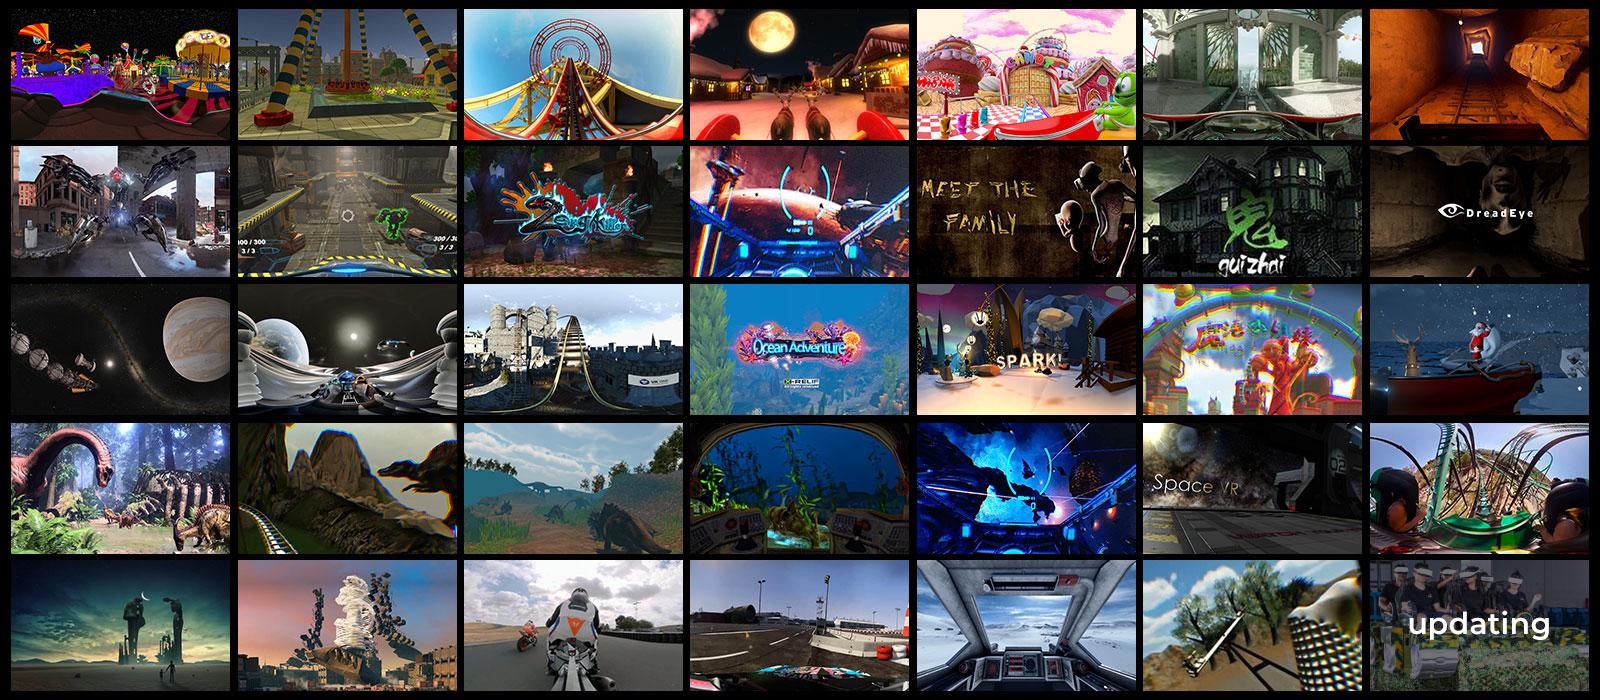 9dvr-tank-heros-games